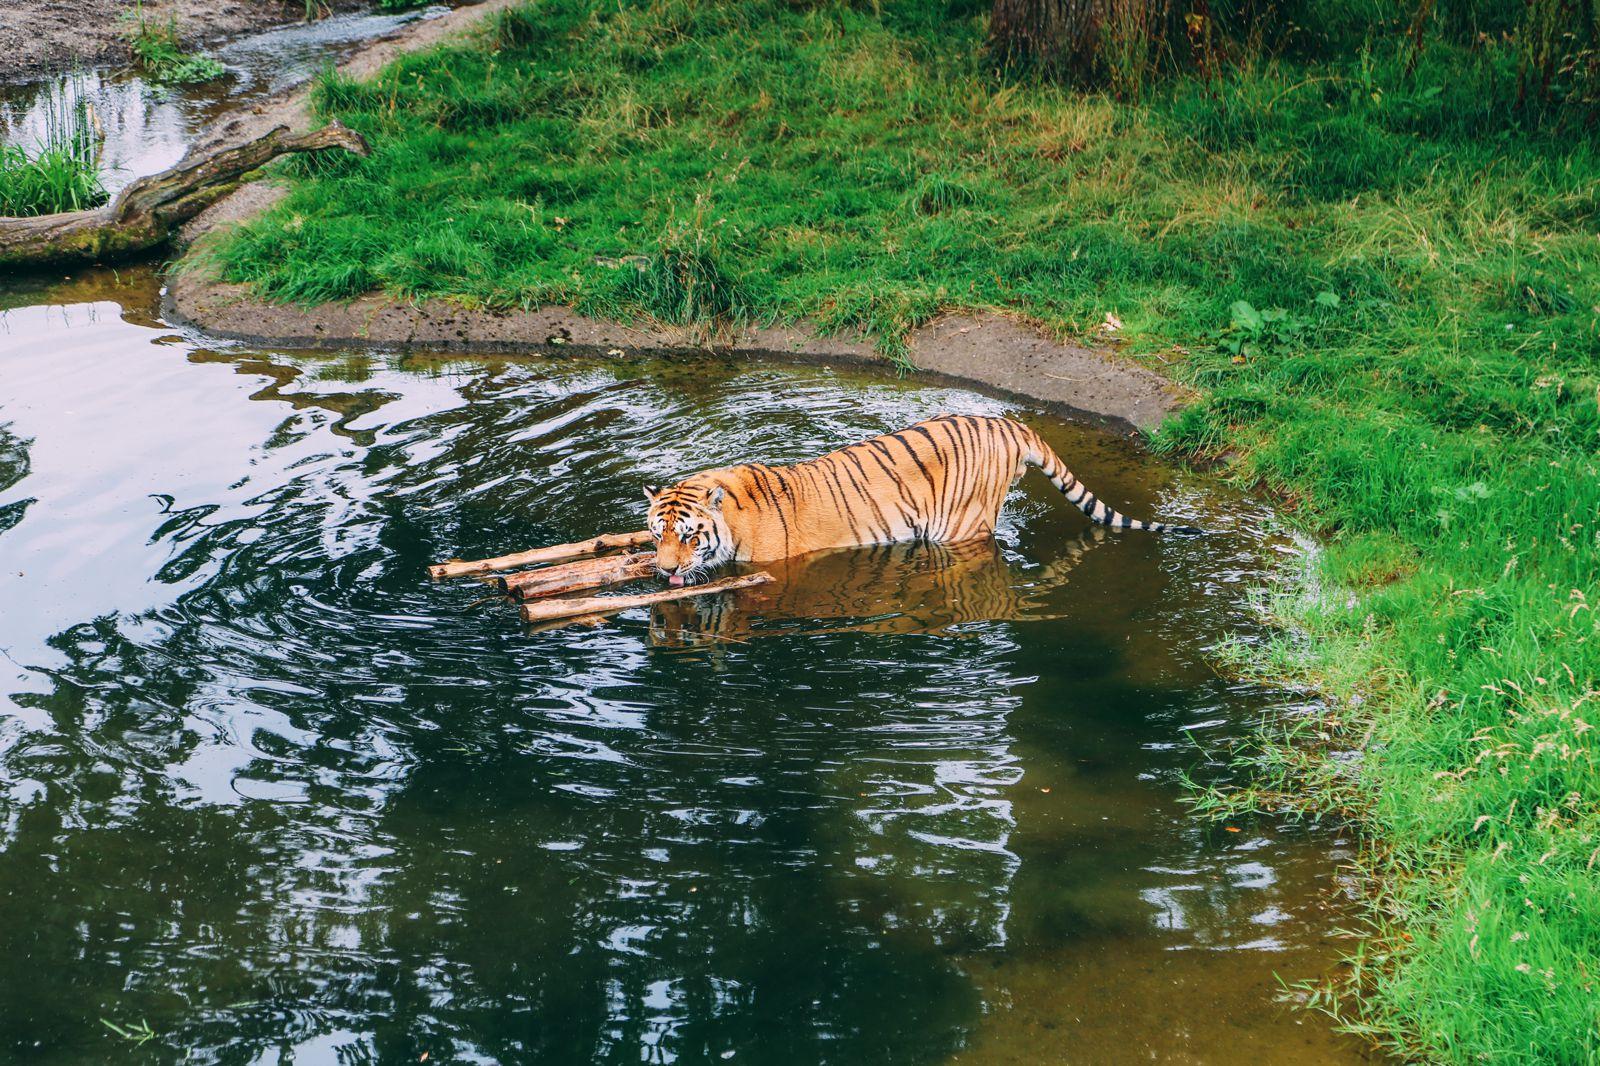 Safari In Scotland - The Photo Diary at Blair Drummond Safari and Adventure Park (23)